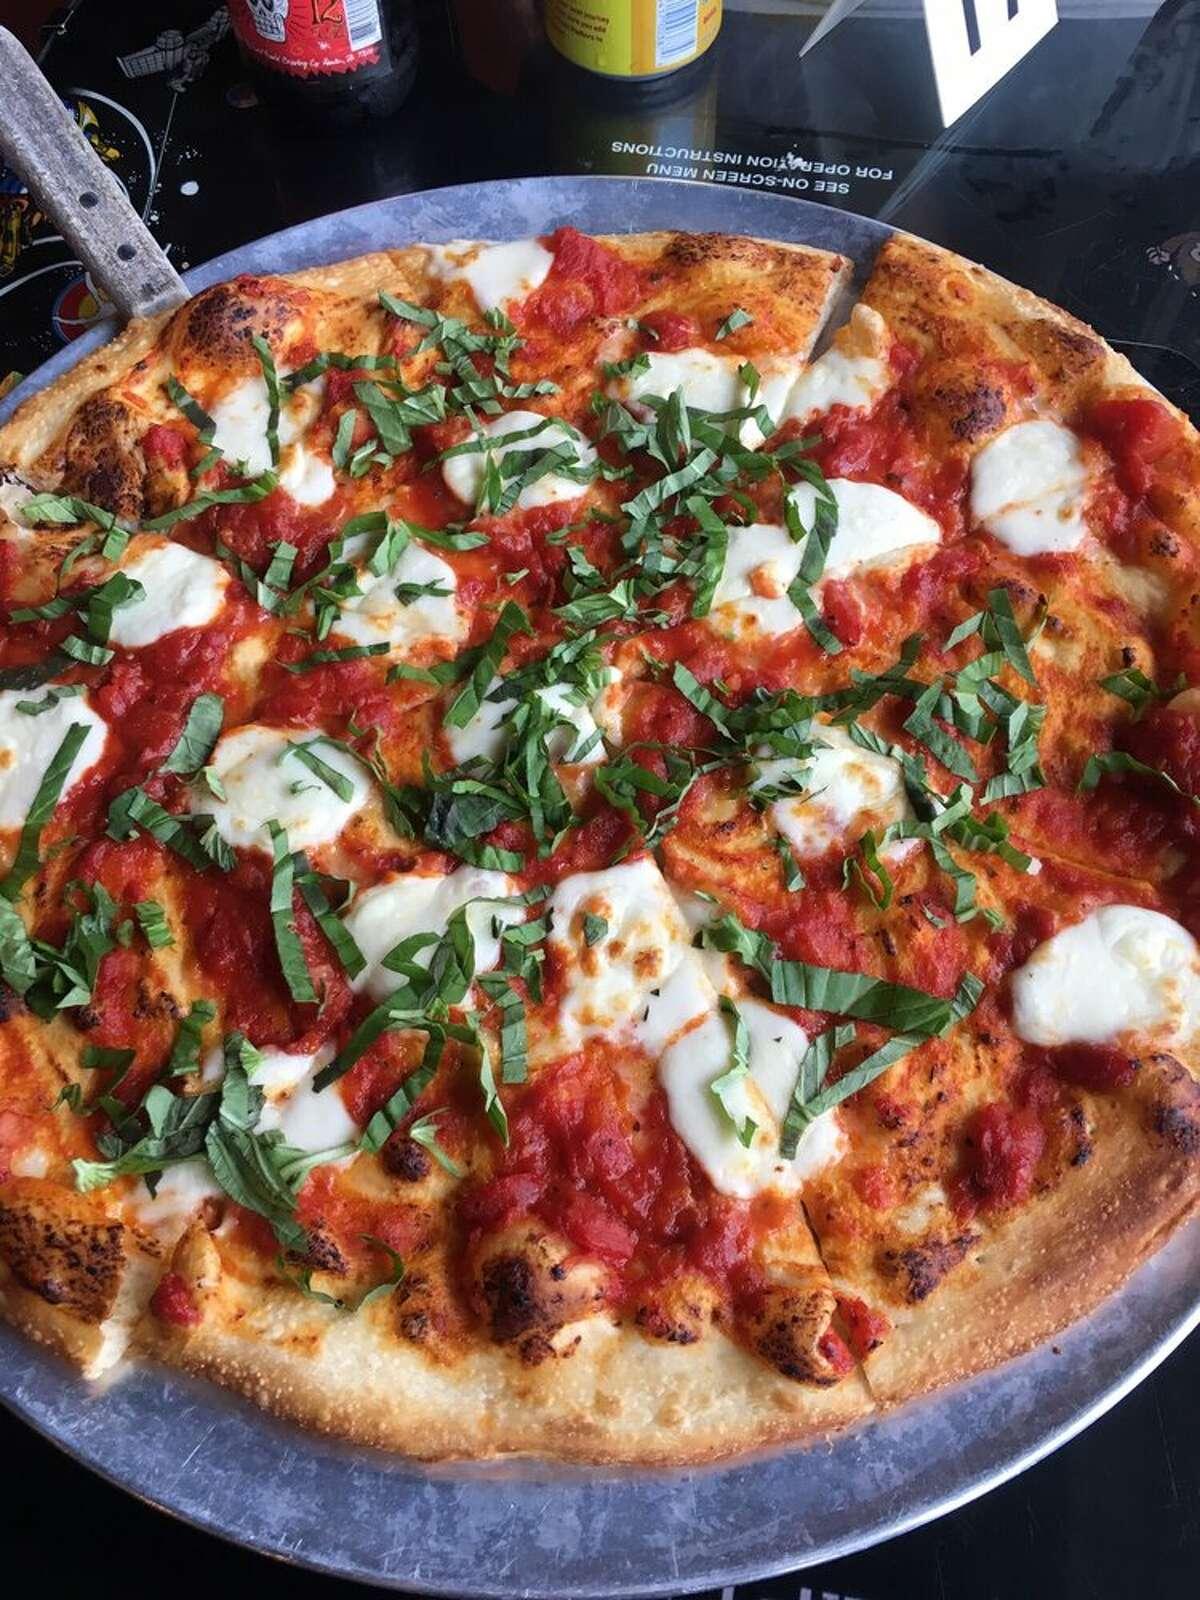 Luna Pizzeria Yelp rating: 4.5 stars Where: Multiple Locations Photo: Emily S./Yelp